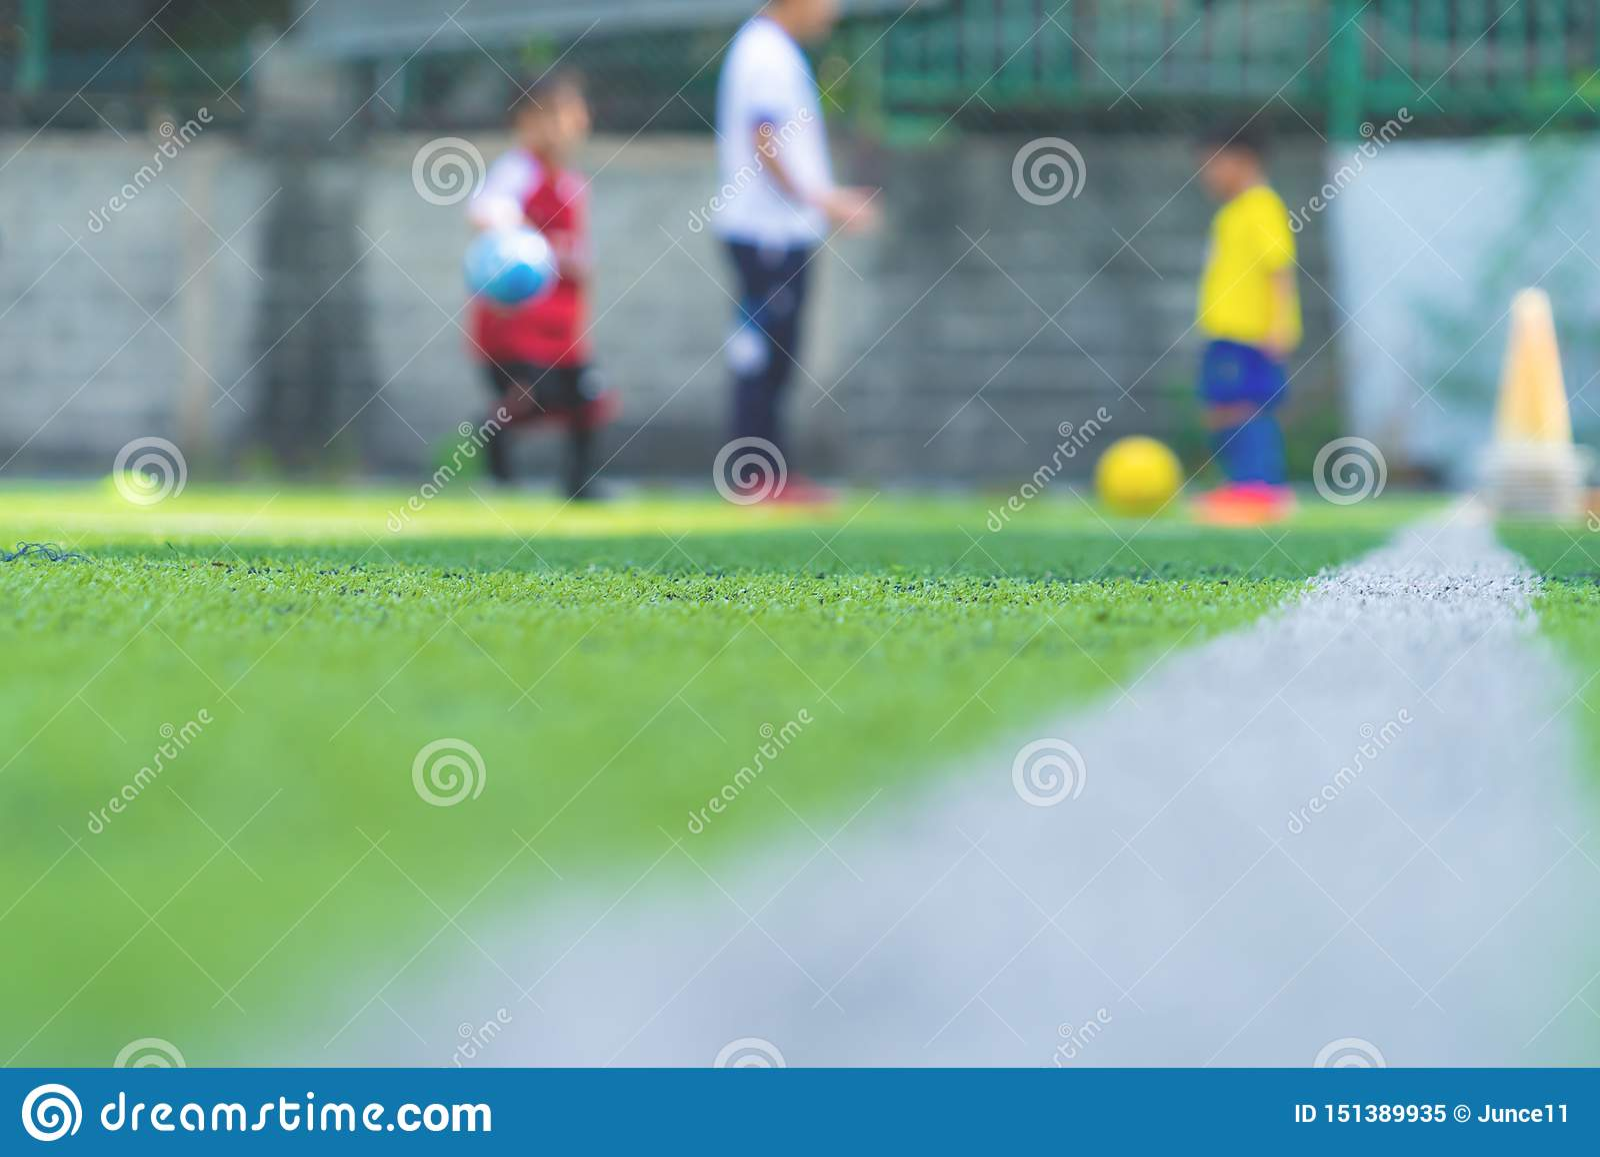 Soccer Academy for children training blurred for background